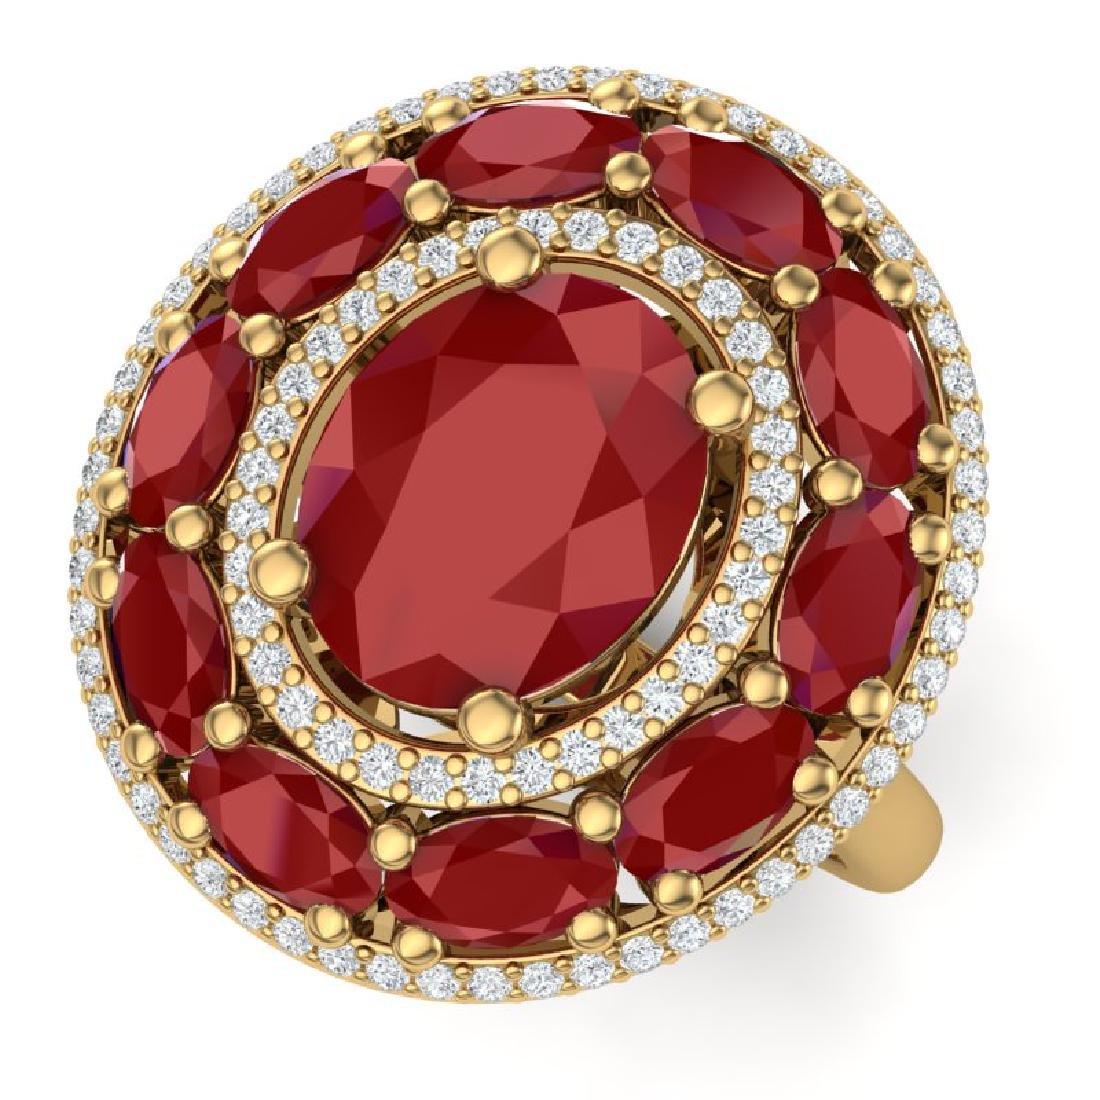 8.05 CTW Royalty Designer Ruby & VS Diamond Ring 18K